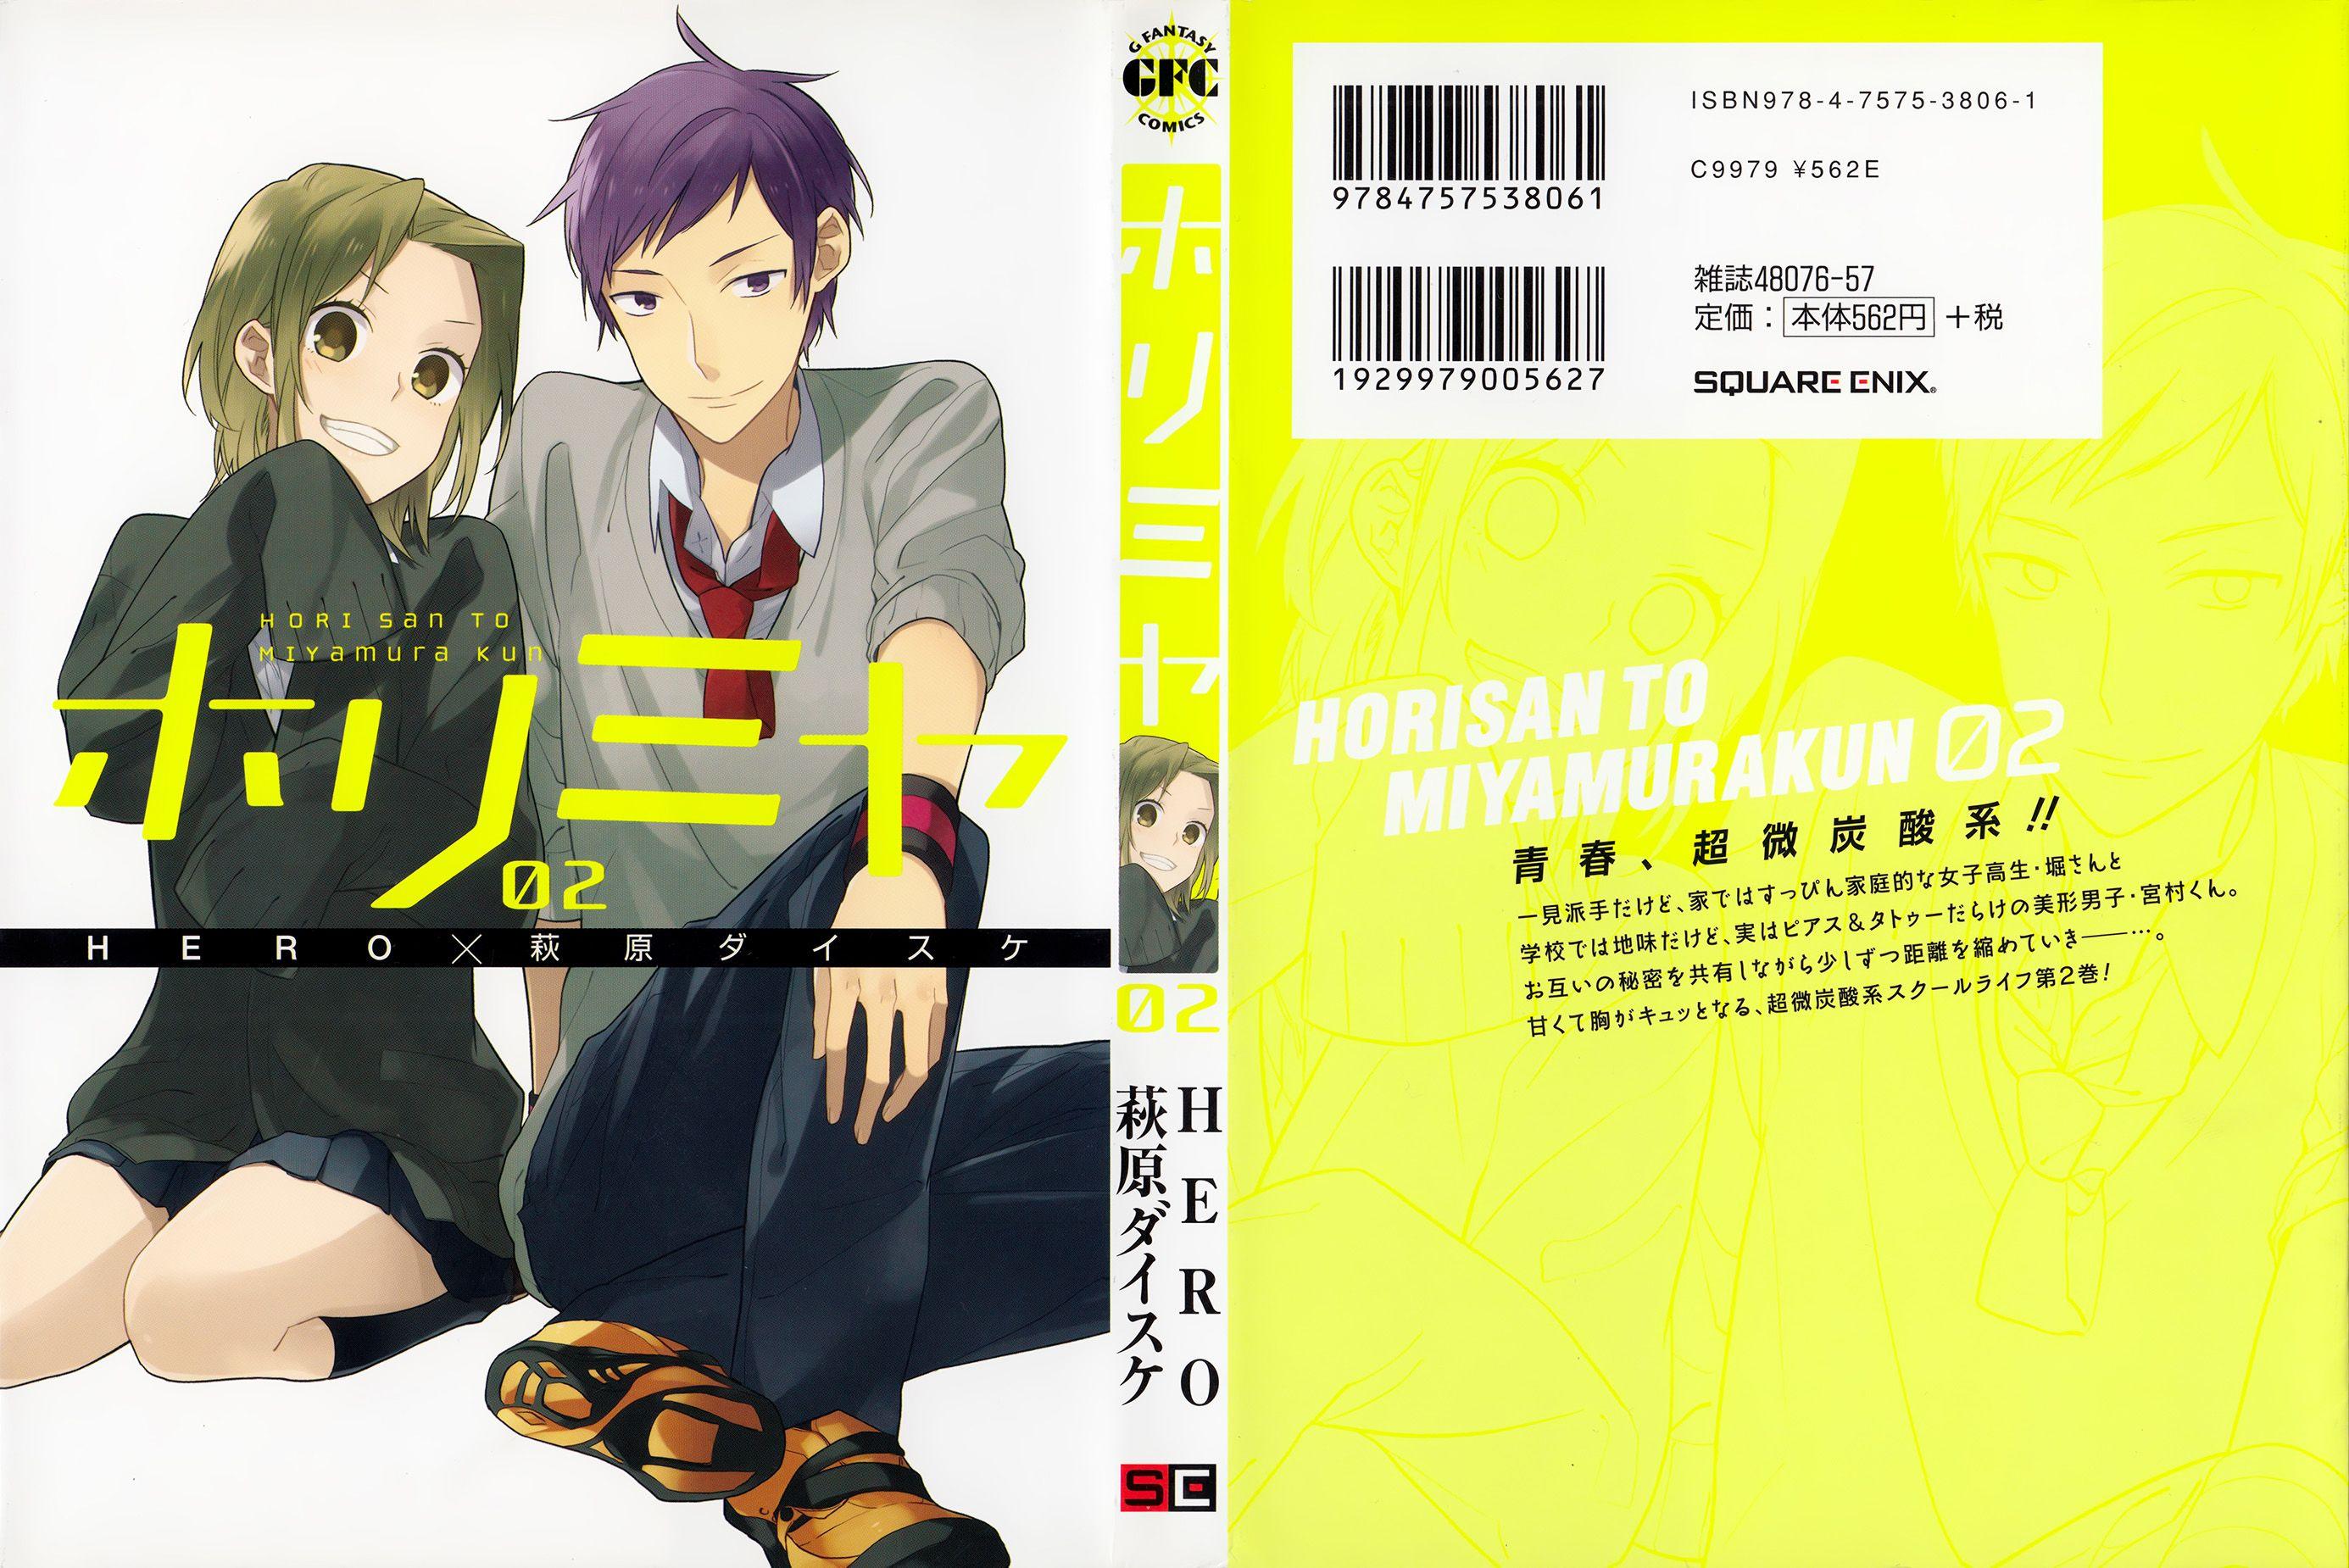 http://c5.ninemanga.com/es_manga/pic2/19/1043/501788/91ce5b36b20d9cf27bc678e3ce515765.jpg Page 2